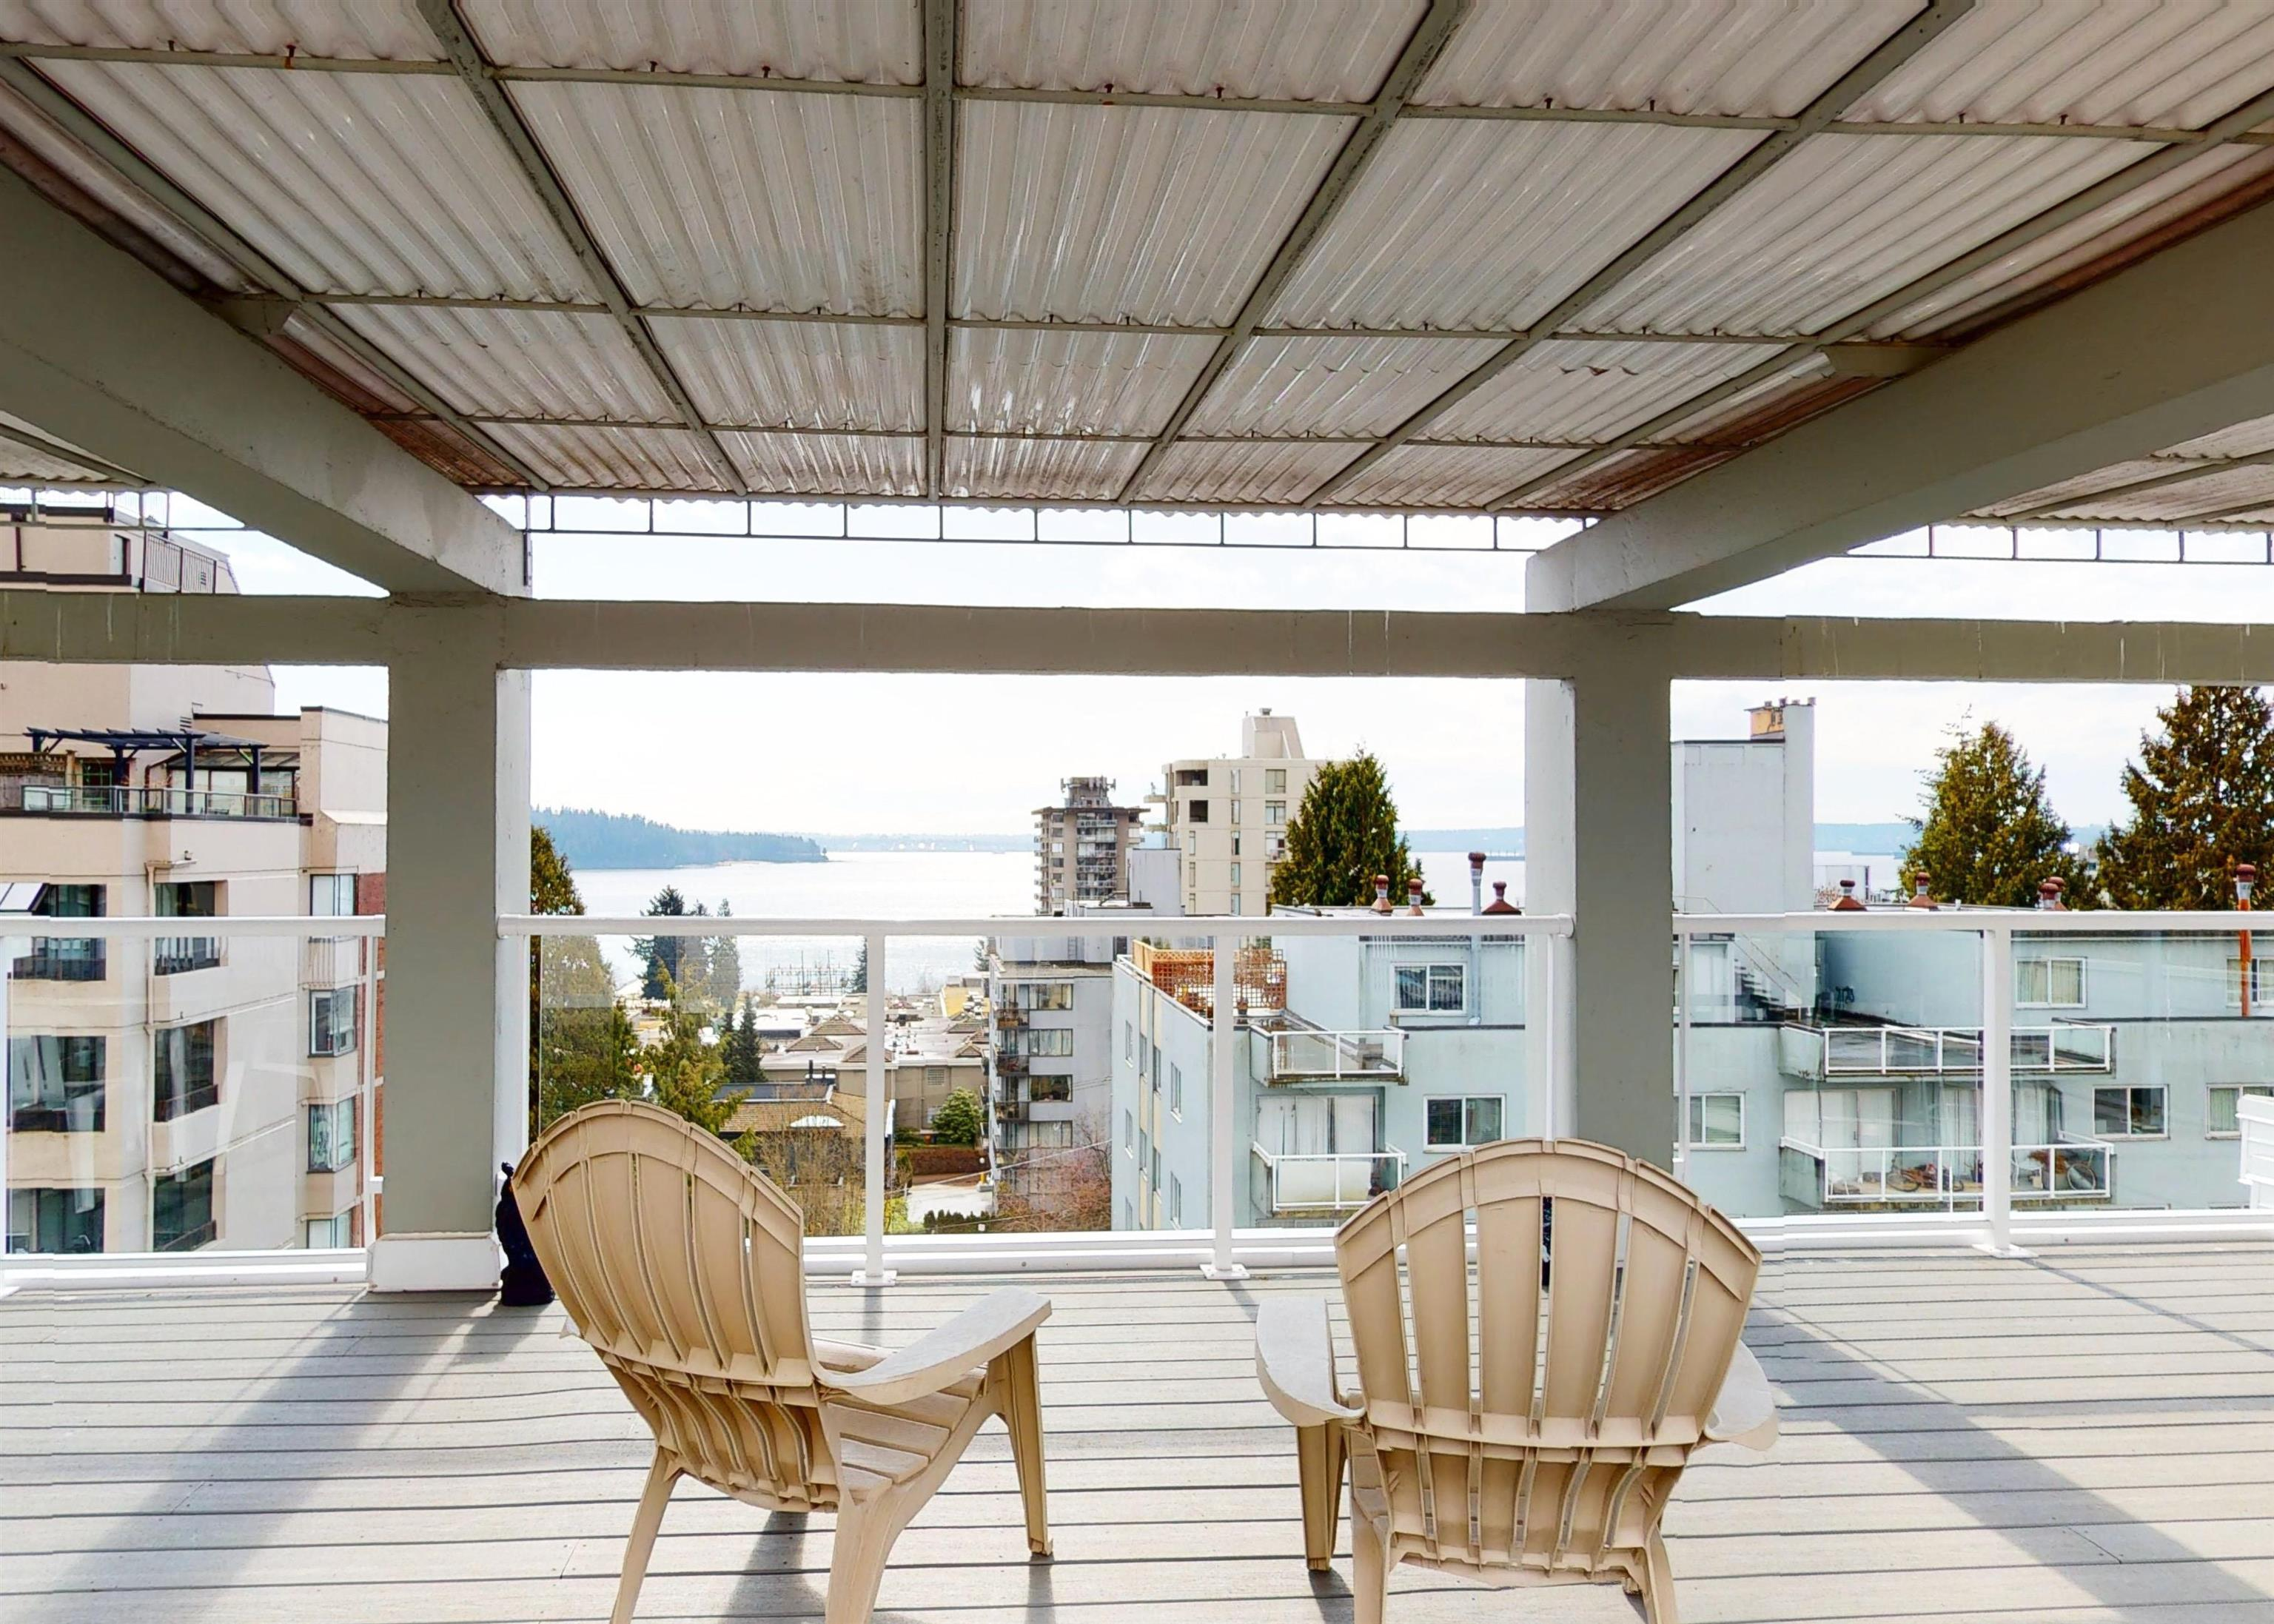 202 1750 ESQUIMALT AVENUE - Ambleside Apartment/Condo for sale, 1 Bedroom (R2610188) - #2